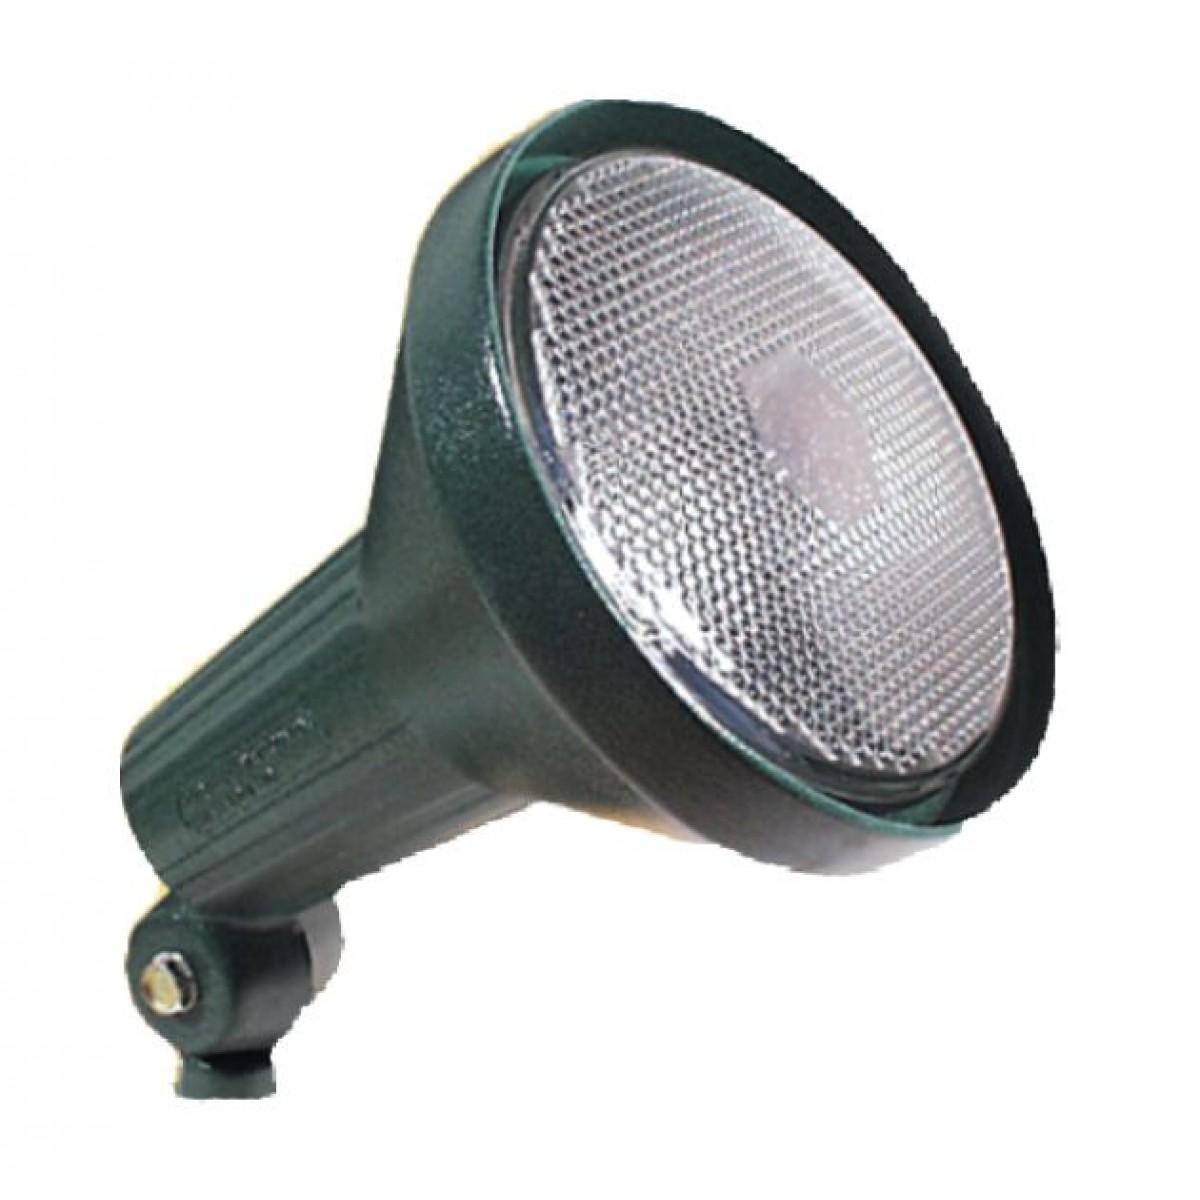 Hl2 - Flood Lights  Hid Lighting